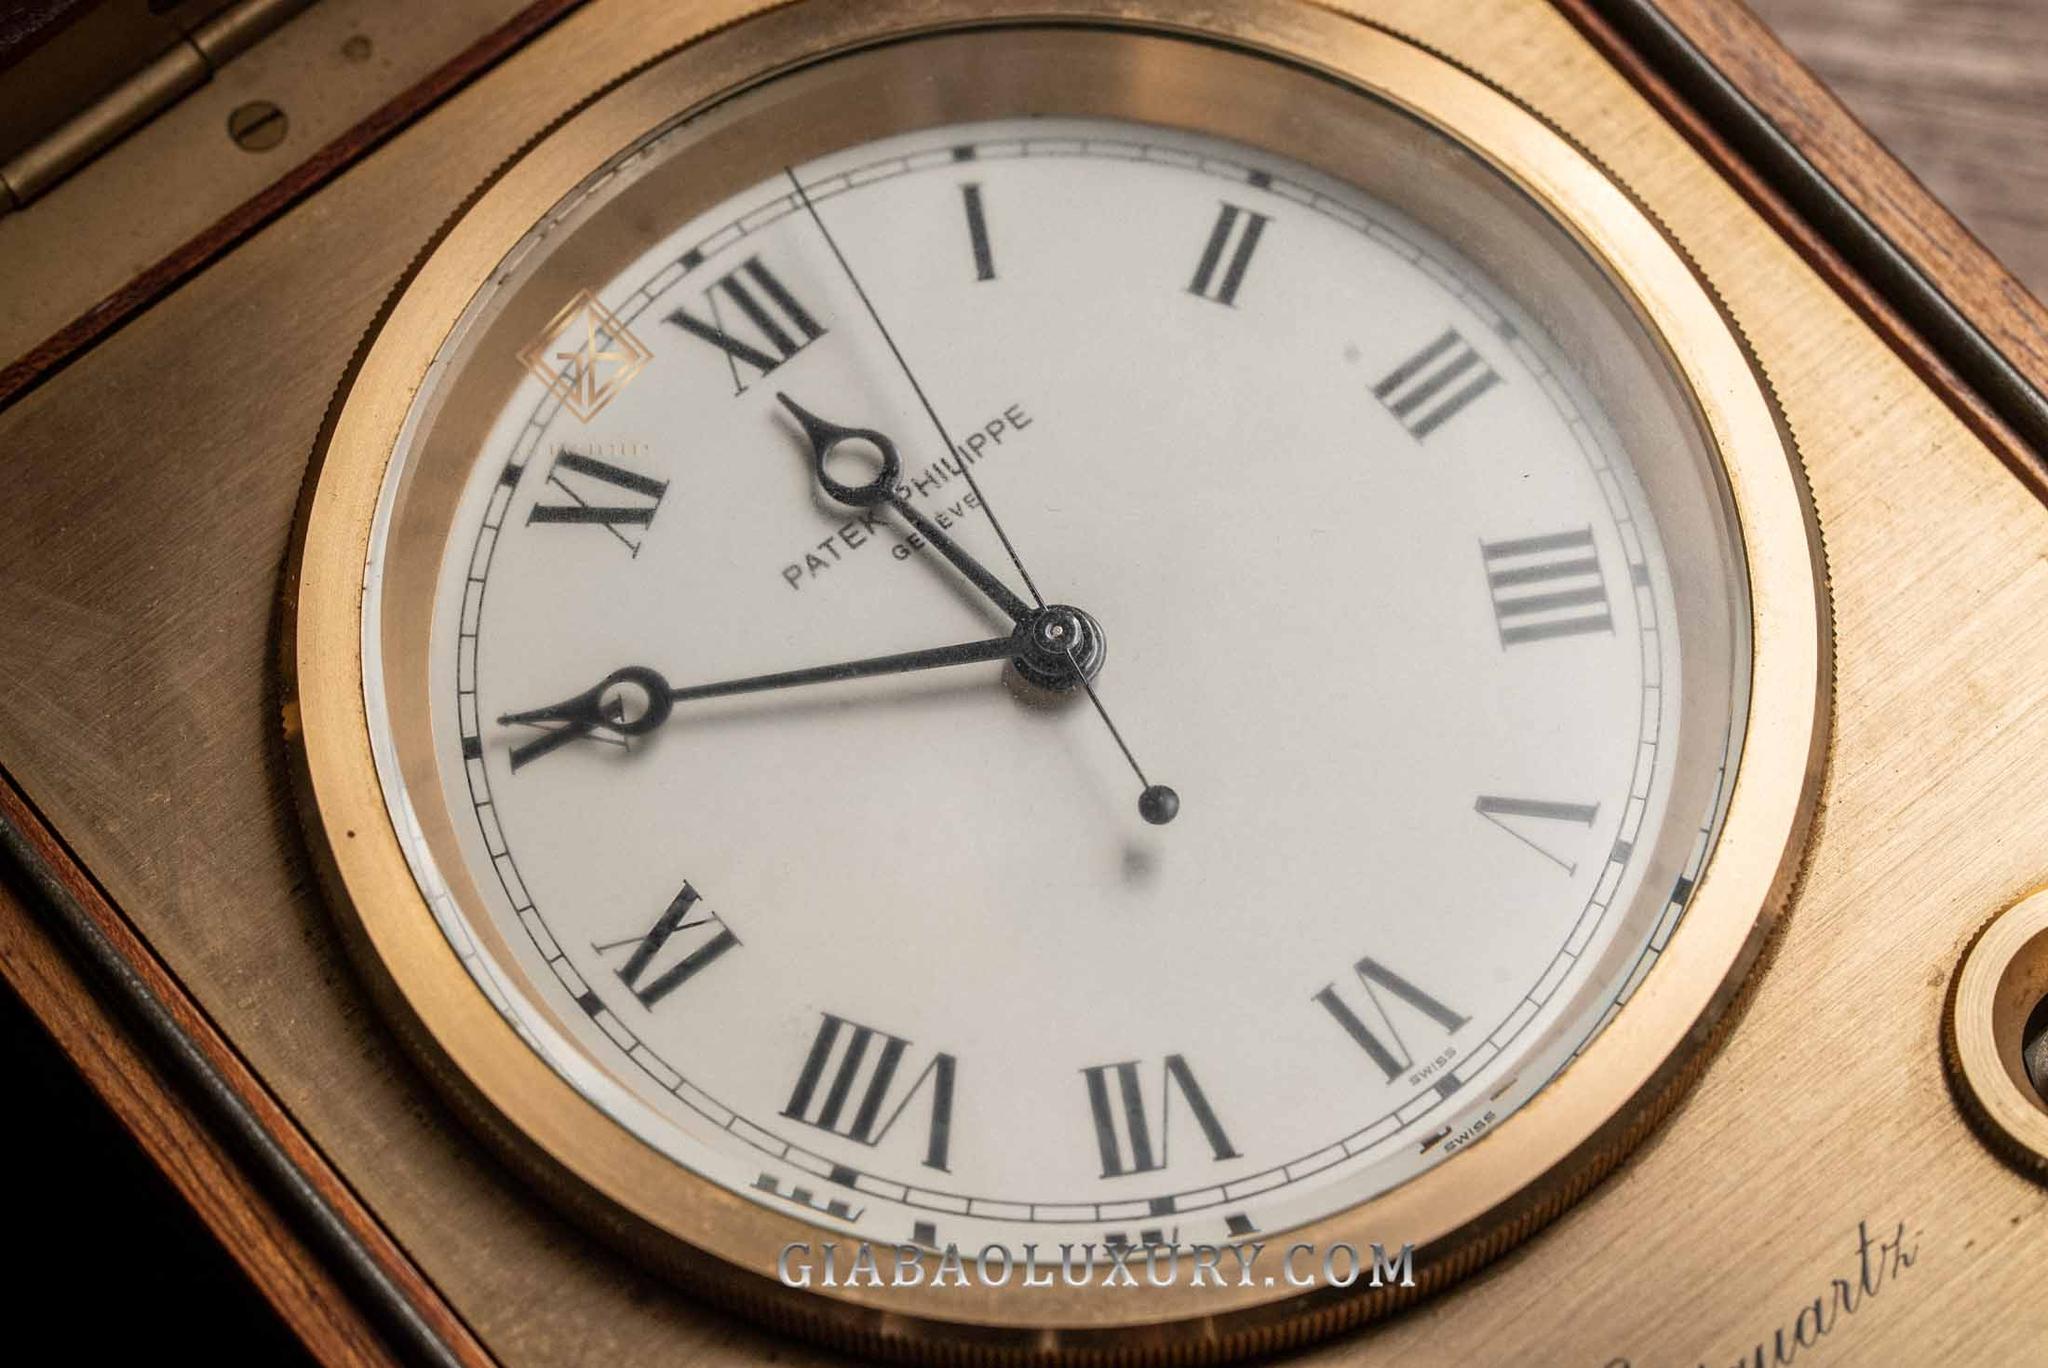 Đồng hồ Patek Philippe Naviquartz III 1215